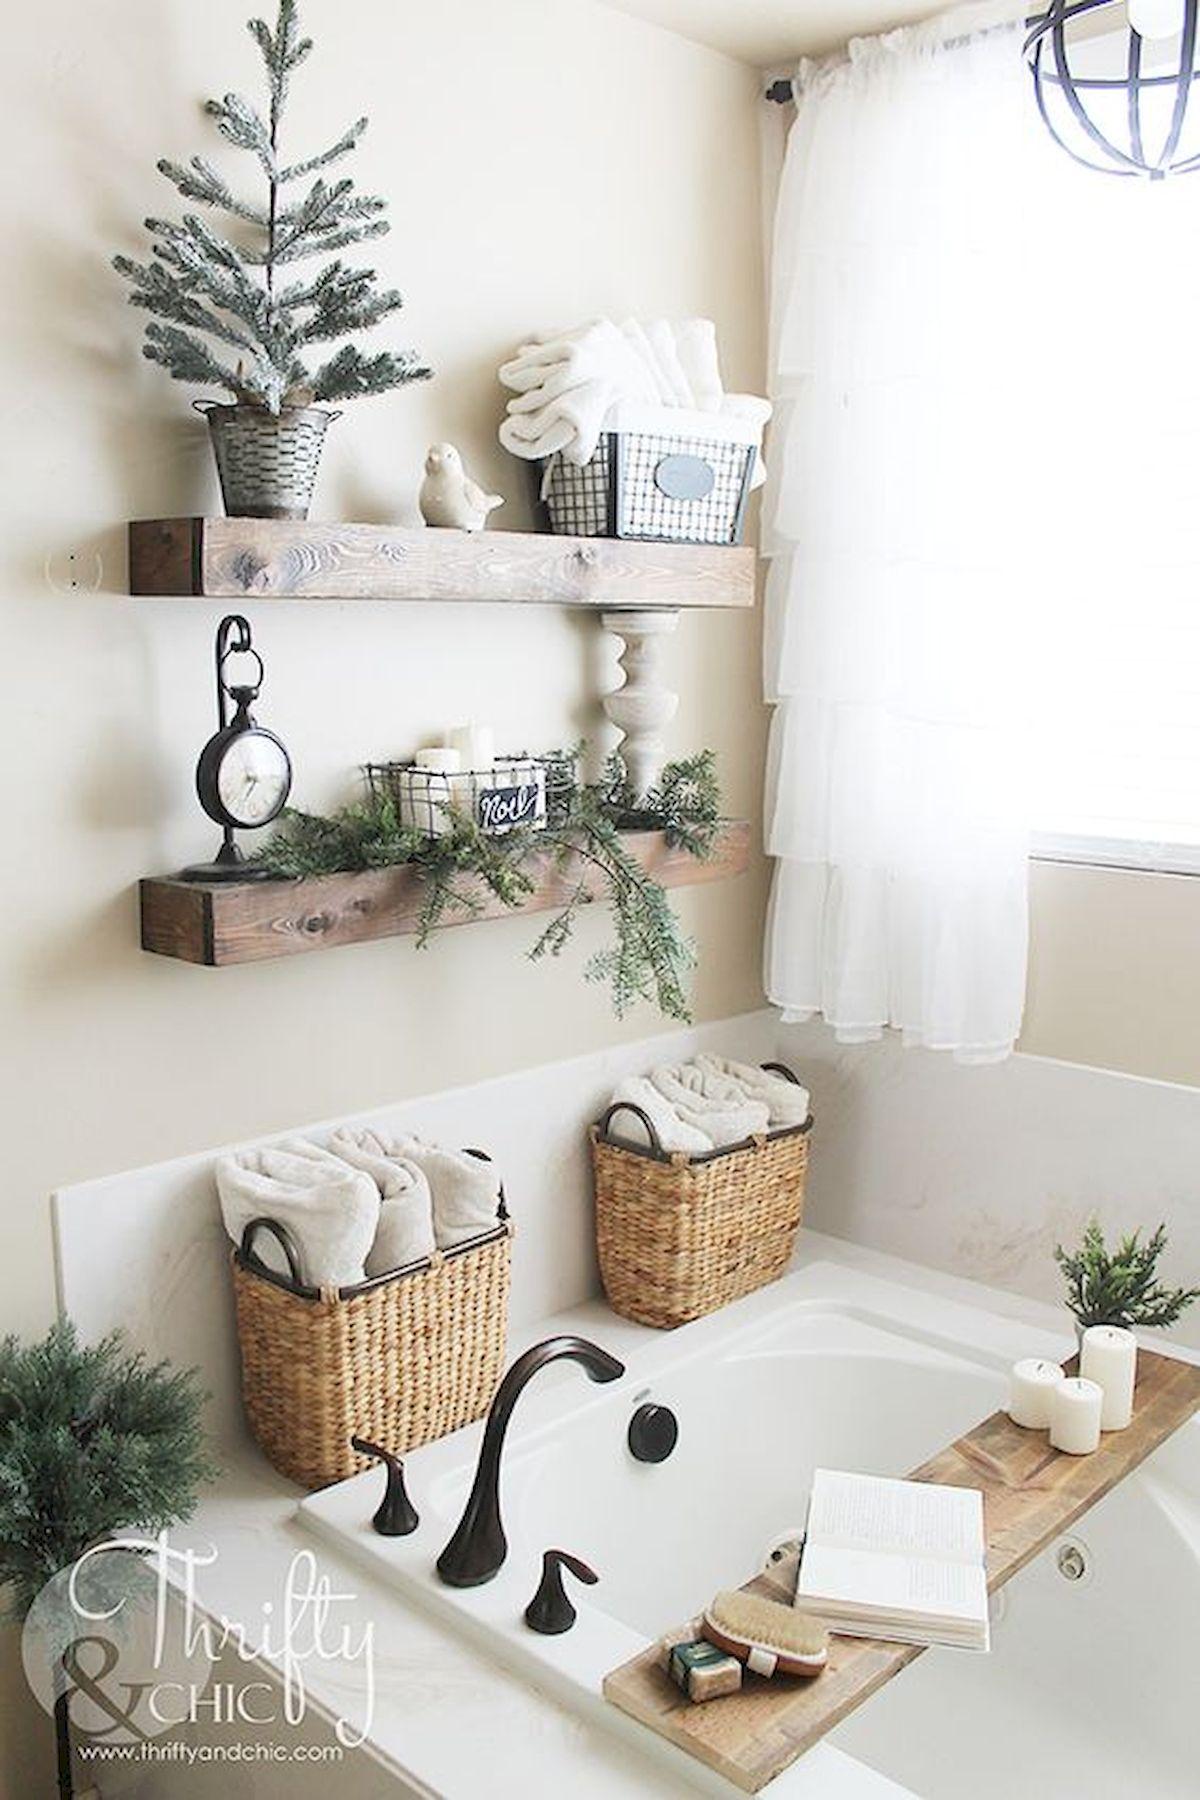 40+ DIY Bathroom Decor And Design Ideas (39)